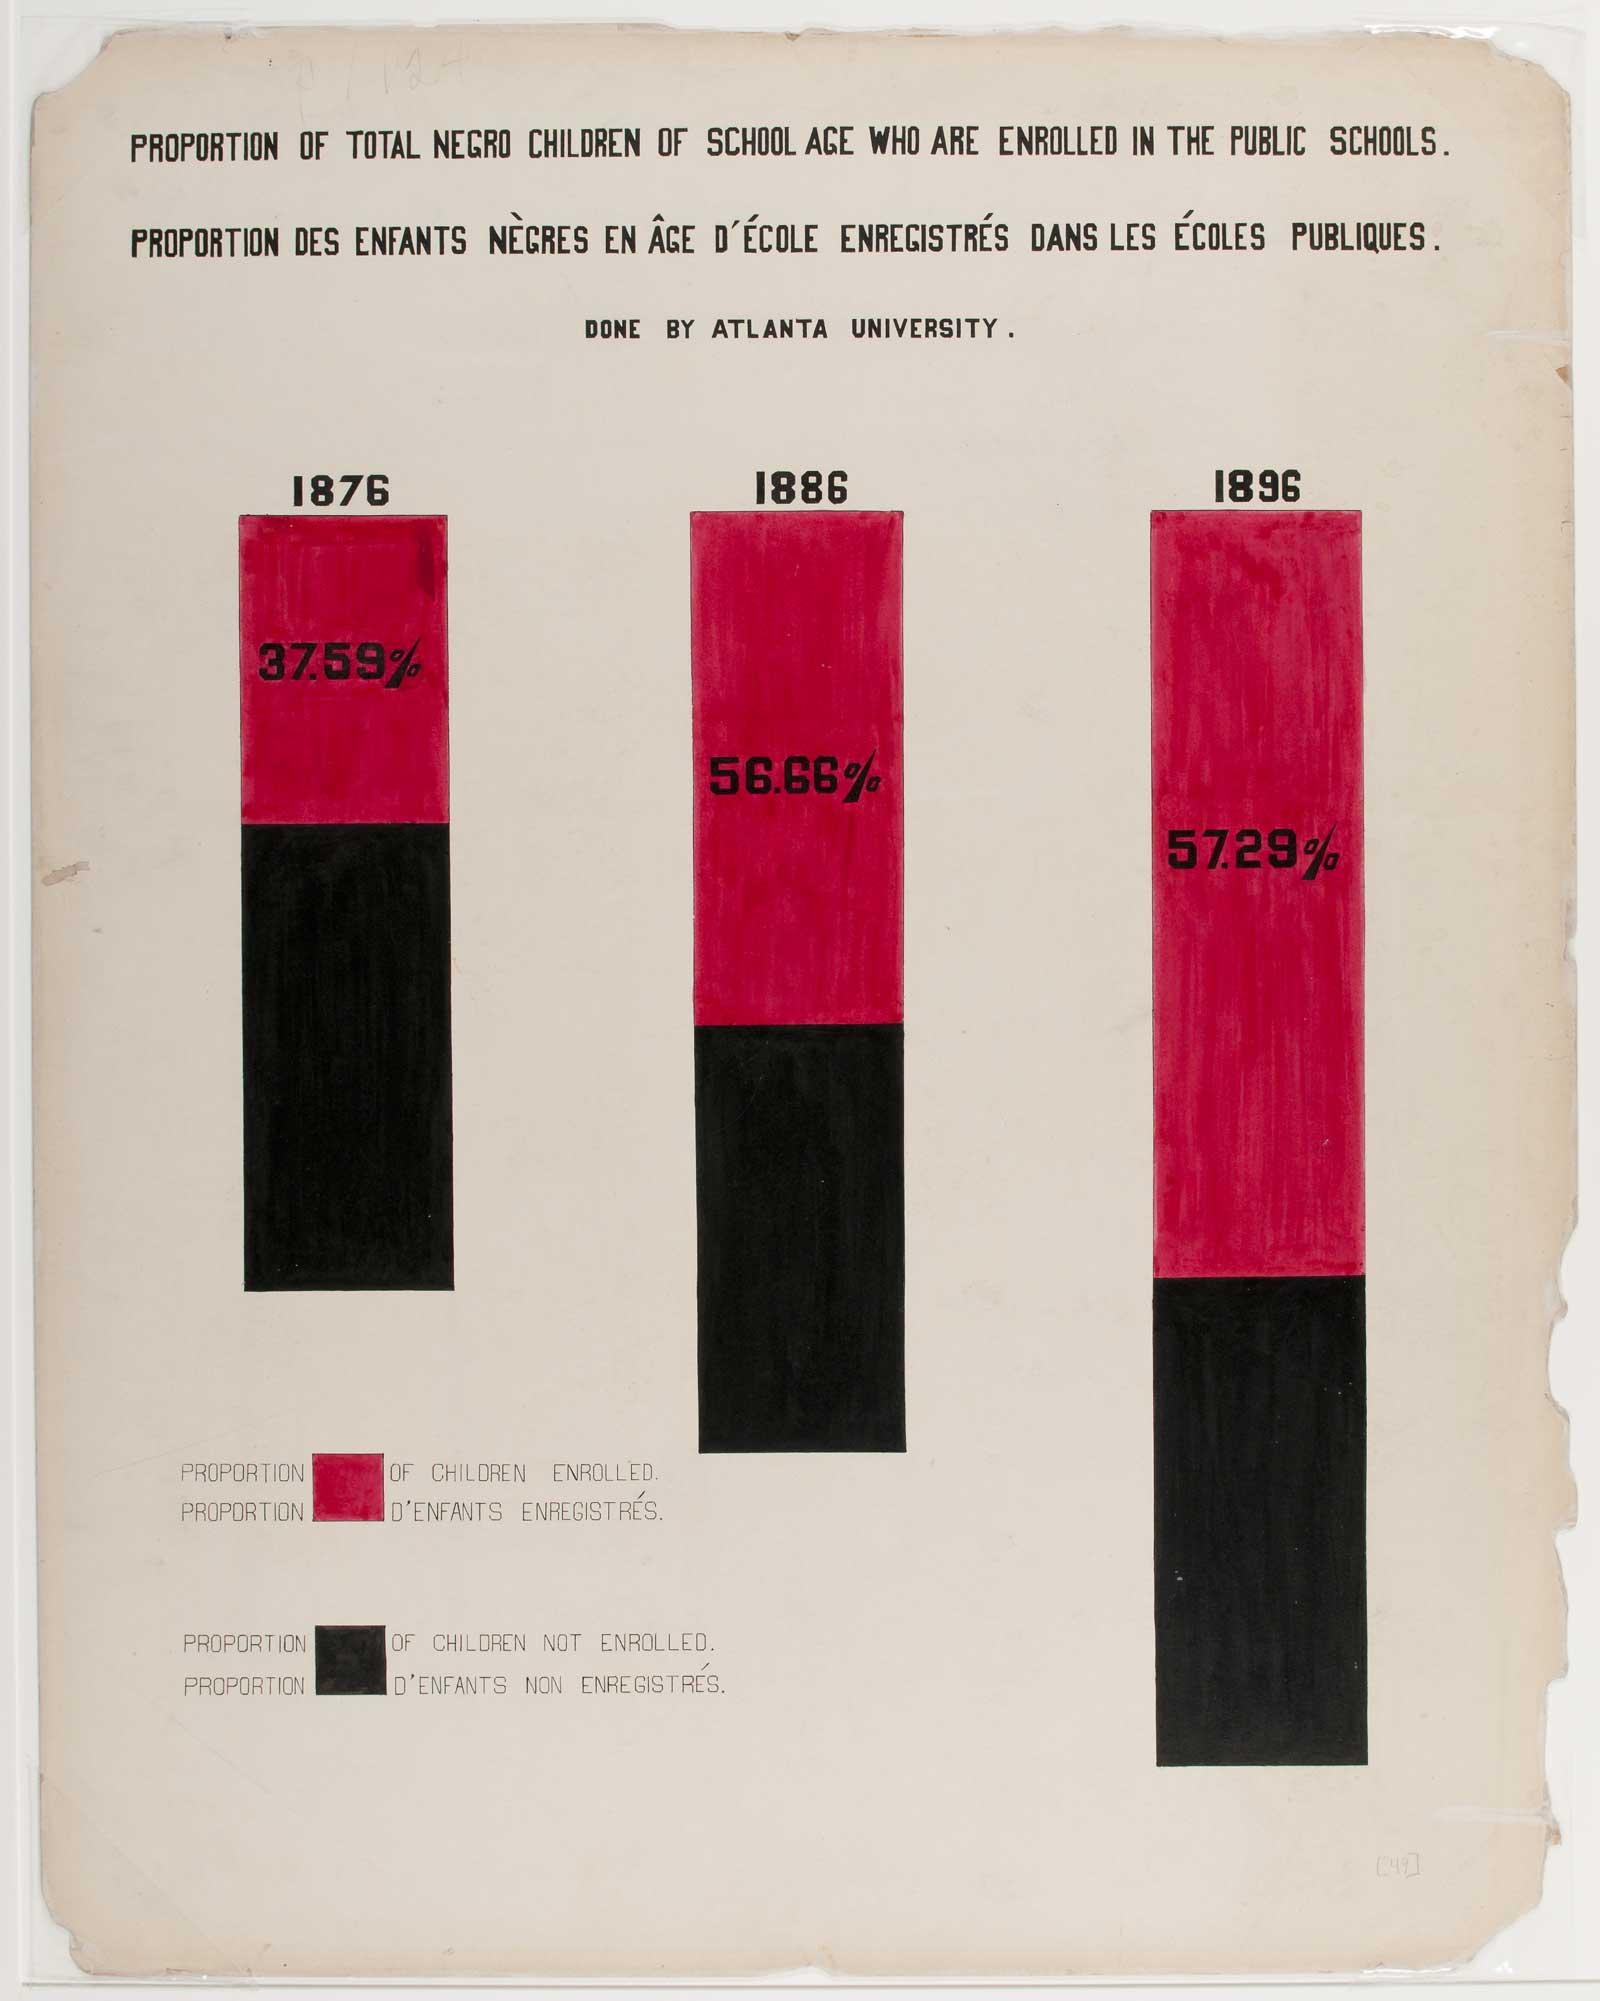 a bar chart with three coloured bars